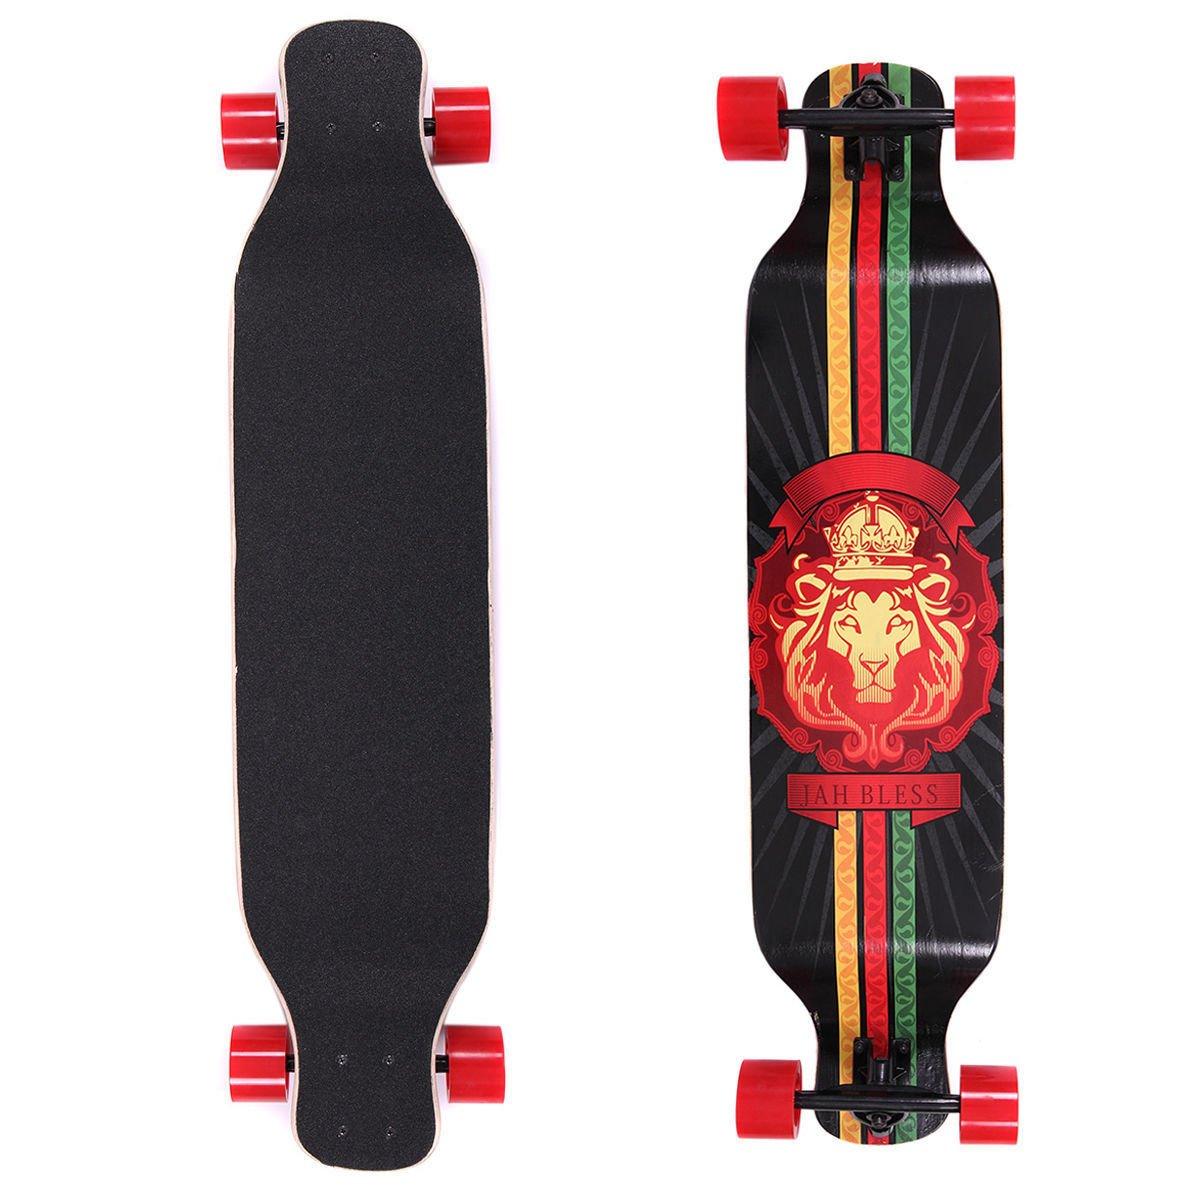 JAXPETY 41 Inch Drop Through Longboard Skateboard Cruiser Through Downhill Complete